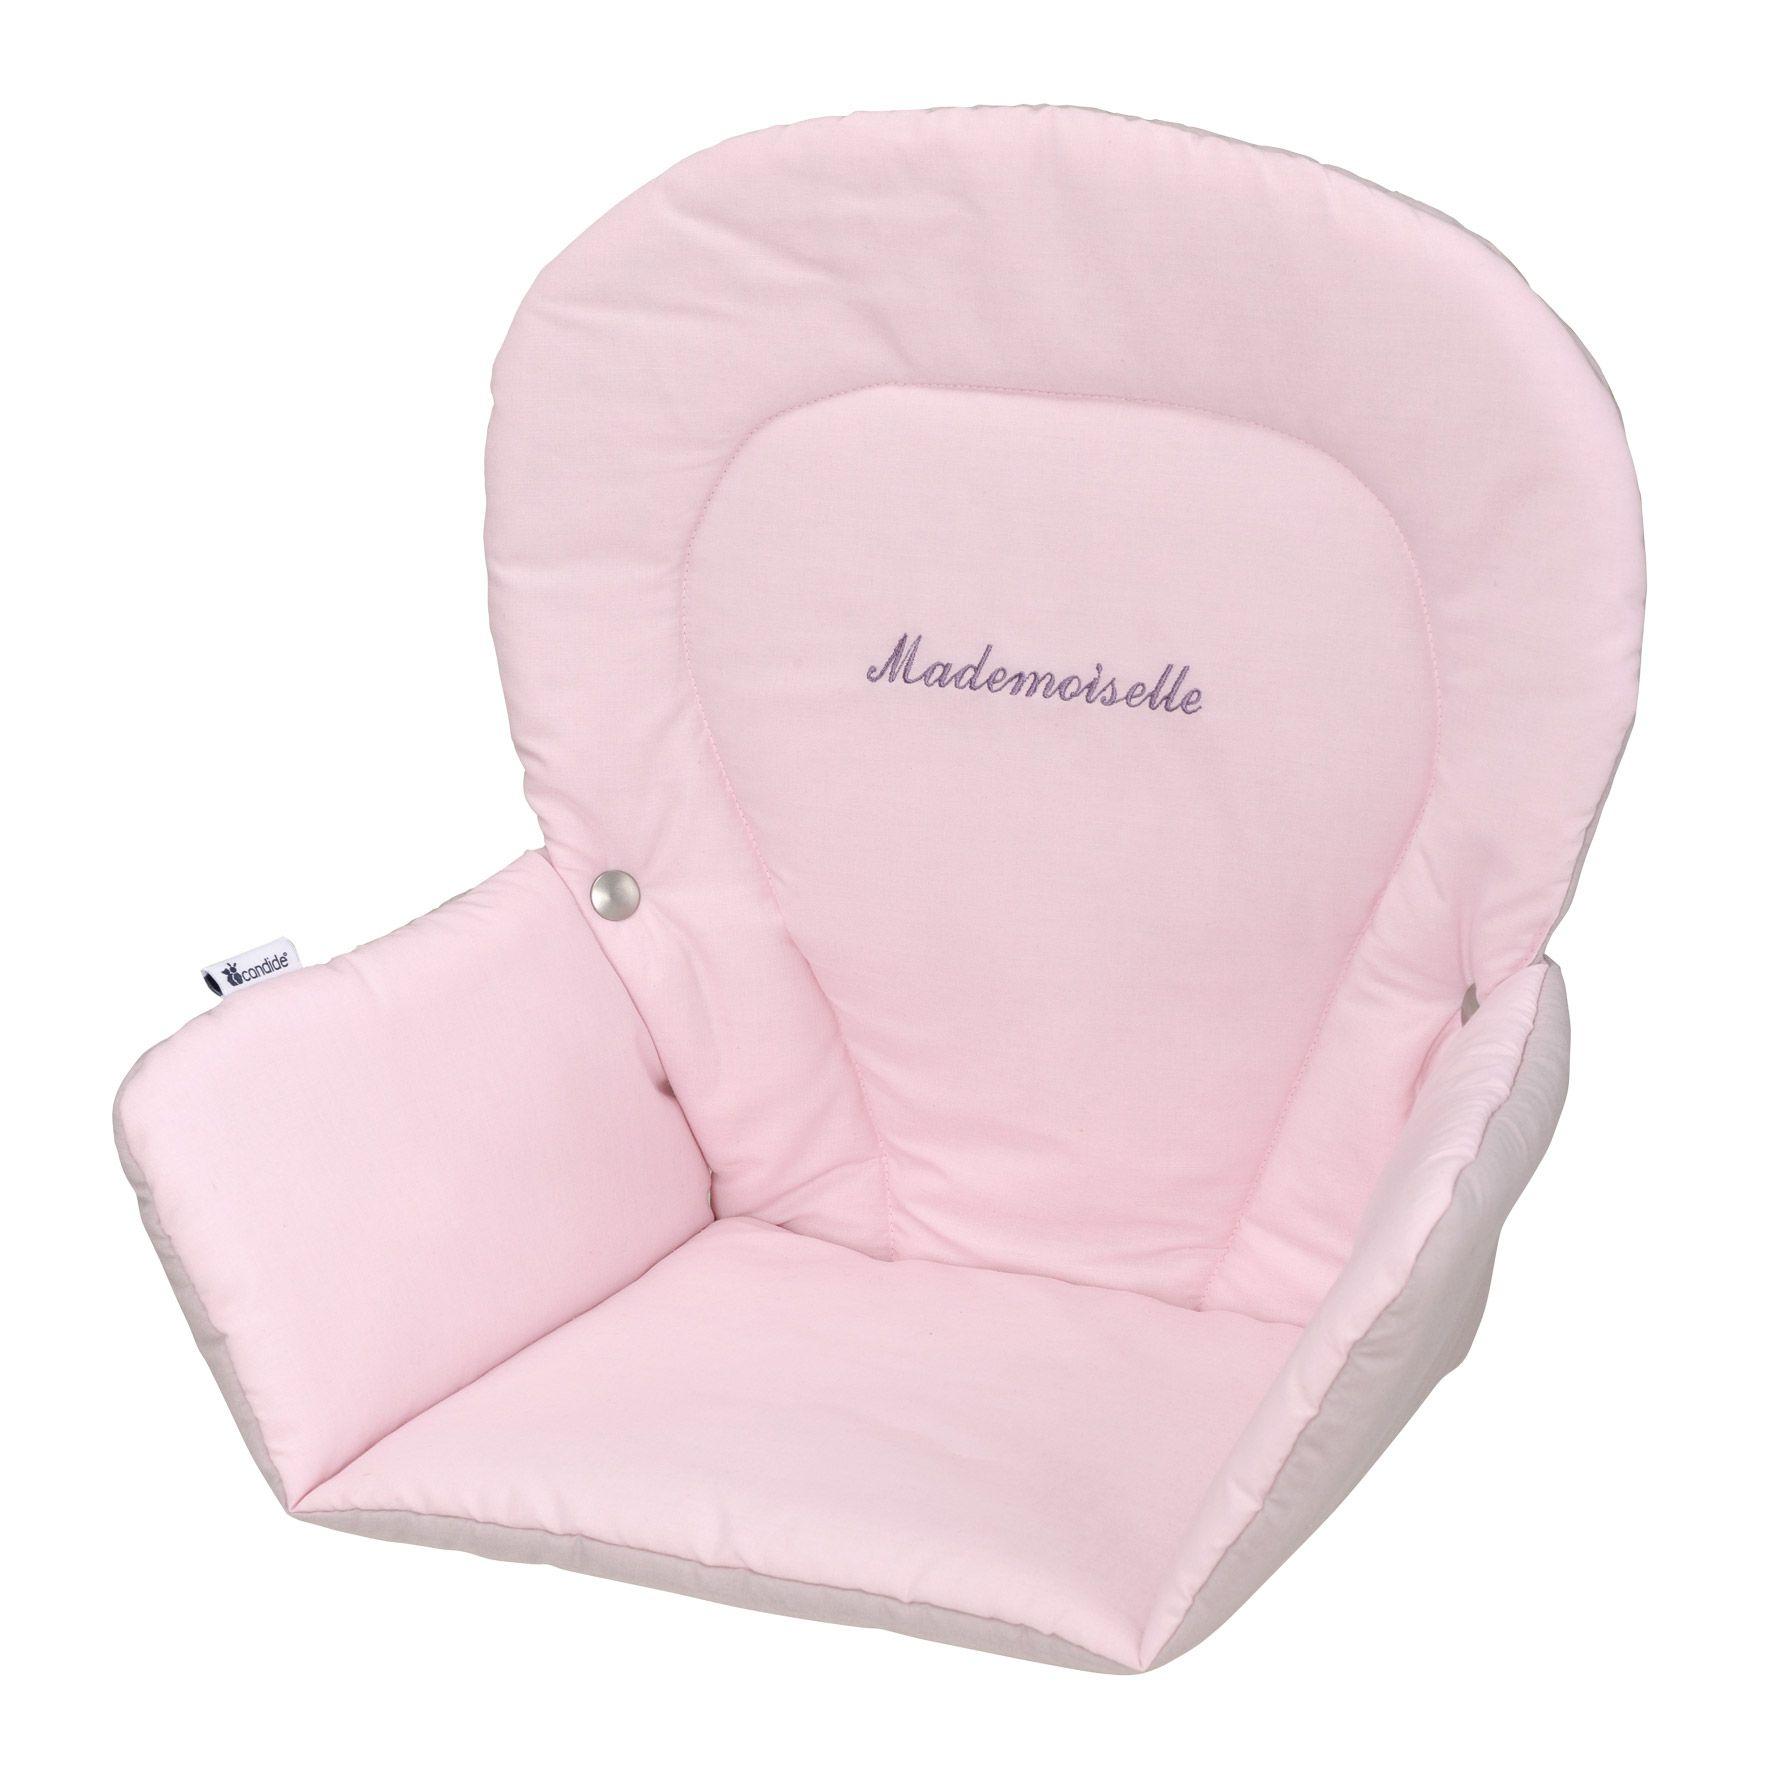 Coussin De Chaise Mademoiselle Coussin Chaise Coussin Chaise Haute